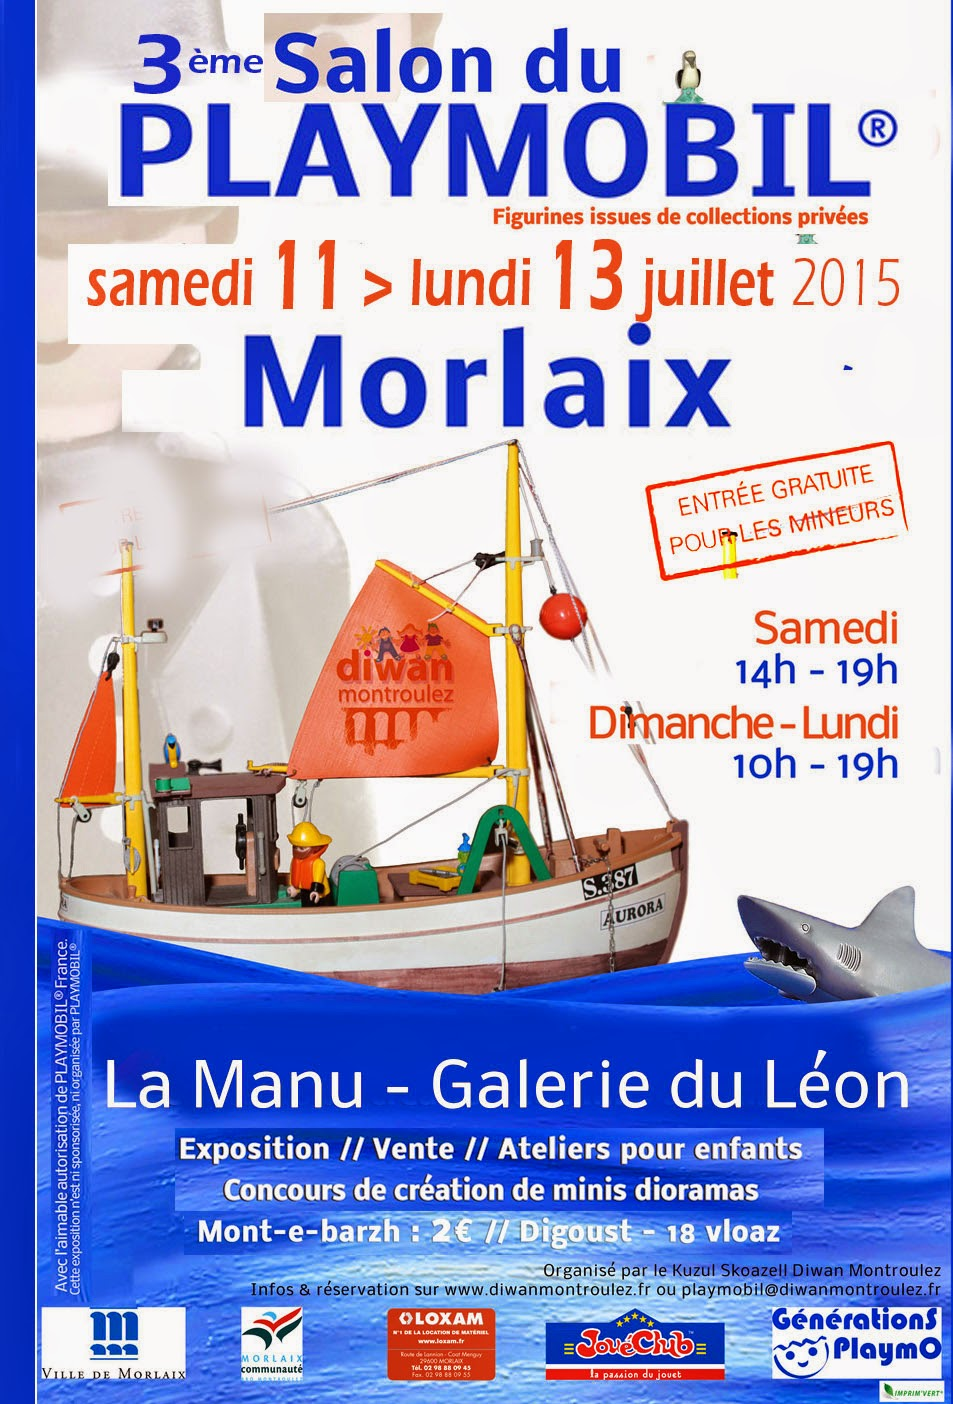 Expo-vente Morlaix, 11-13 juillet 2015